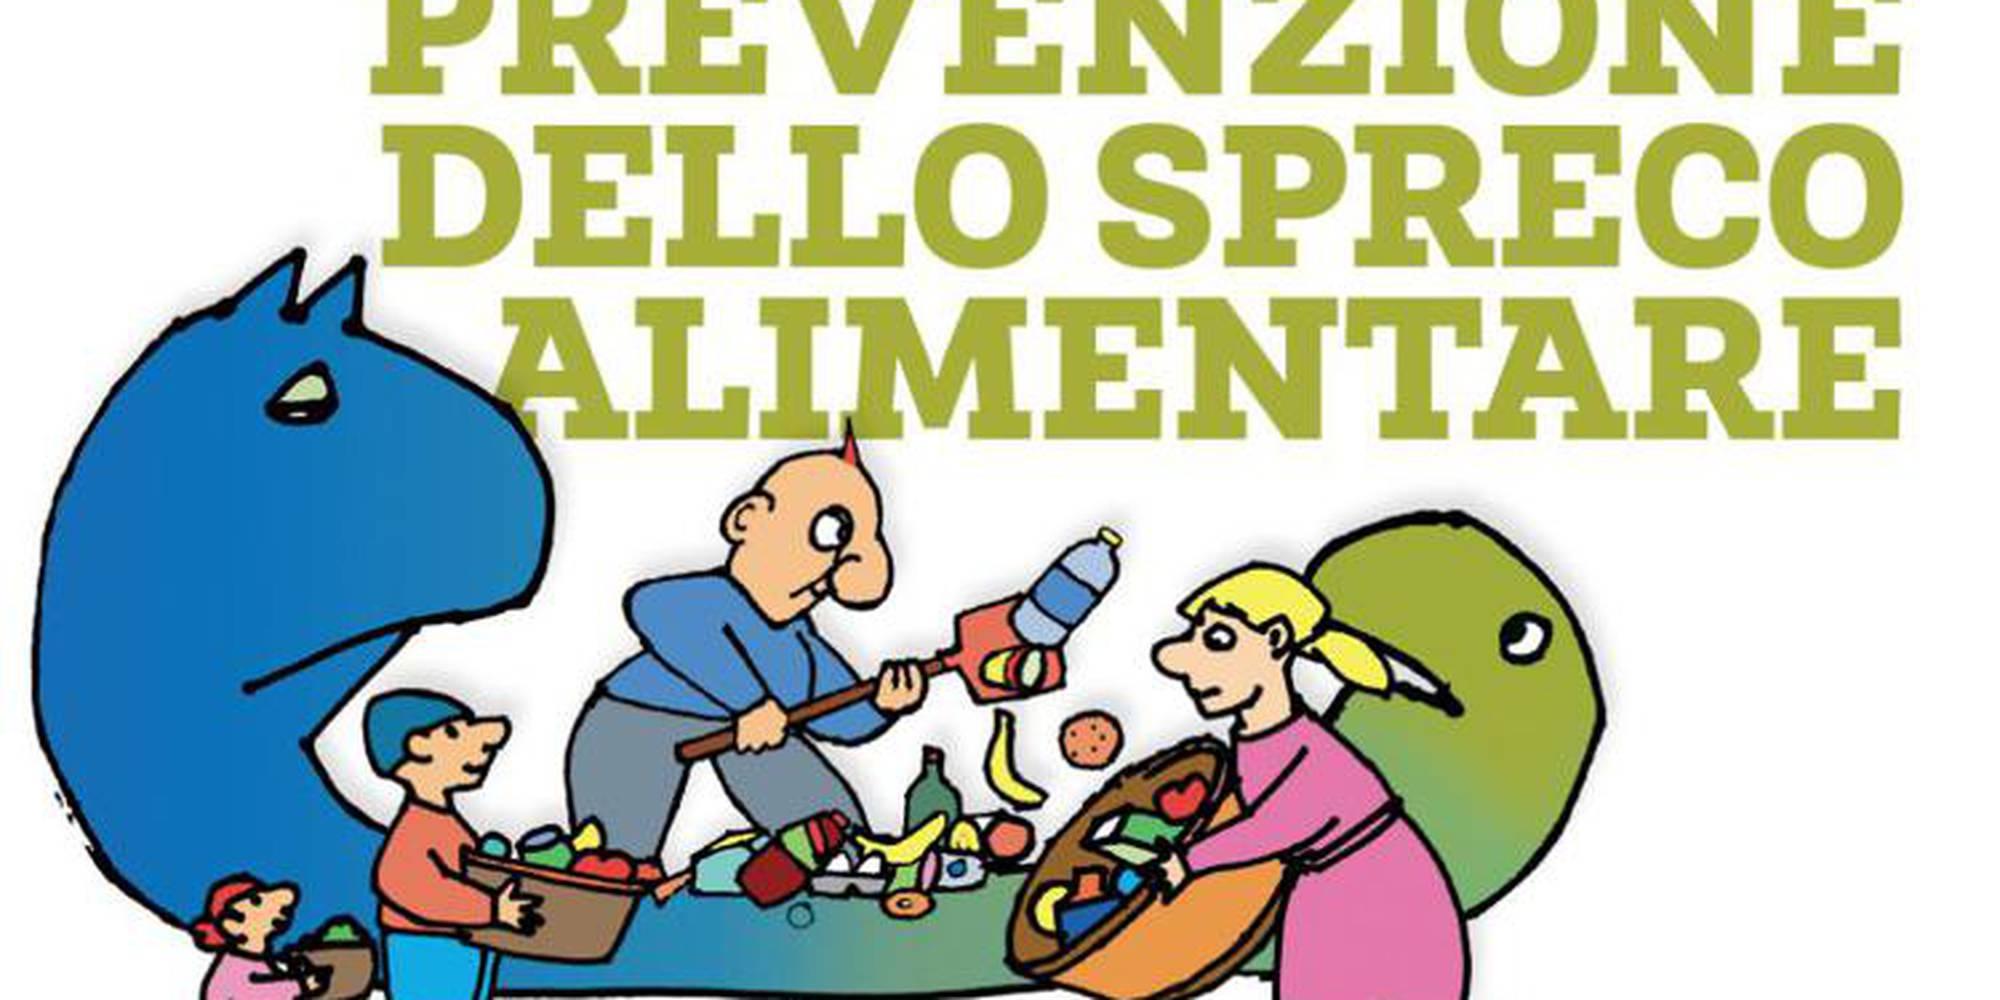 spreco_alimentare_giornata2021.jpg